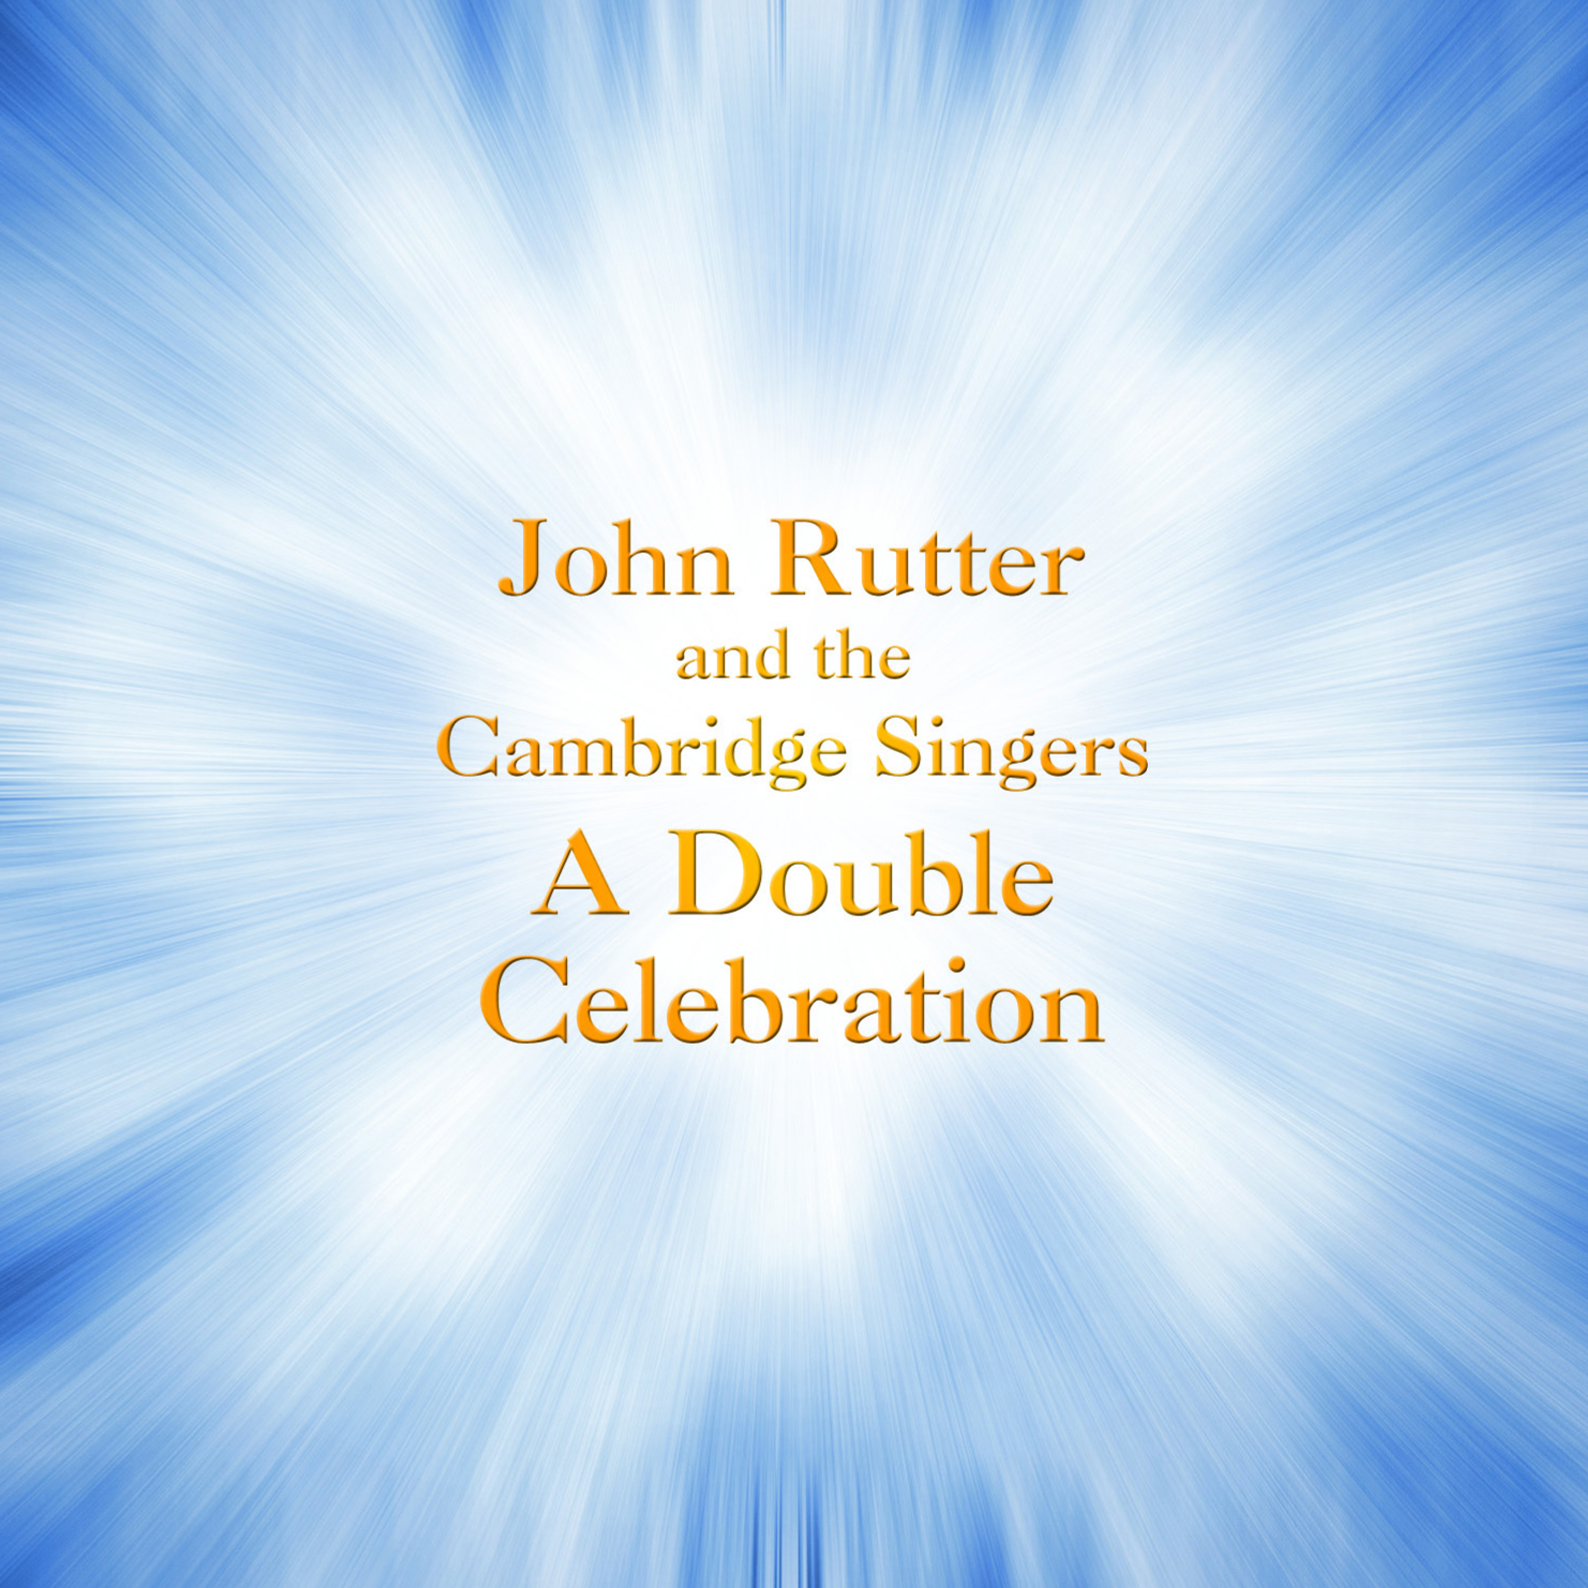 A Double Celebration